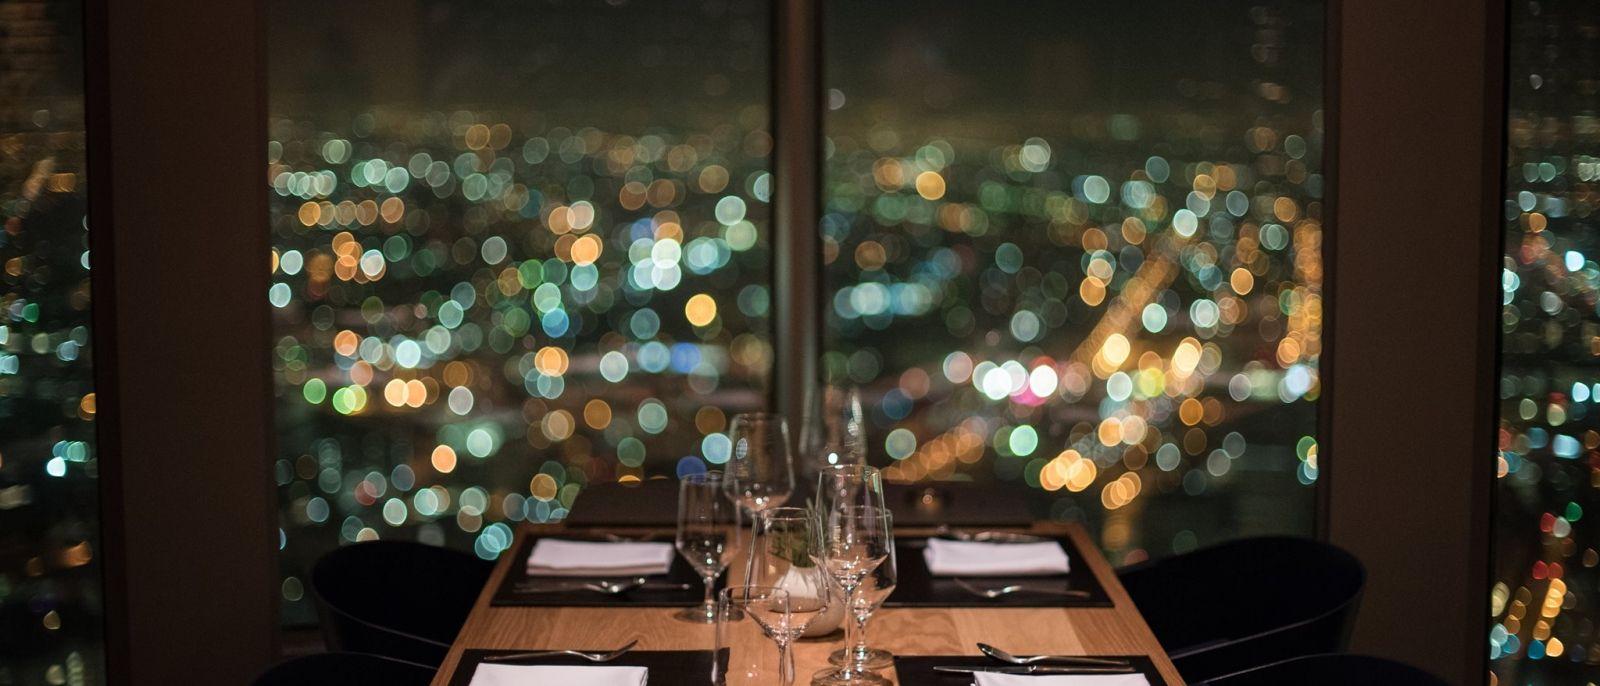 The Best Restaurants With A View In Los Angeles Discover Los Angeles Los Angeles Restaurants Lobster Restaurant Terranea Resort